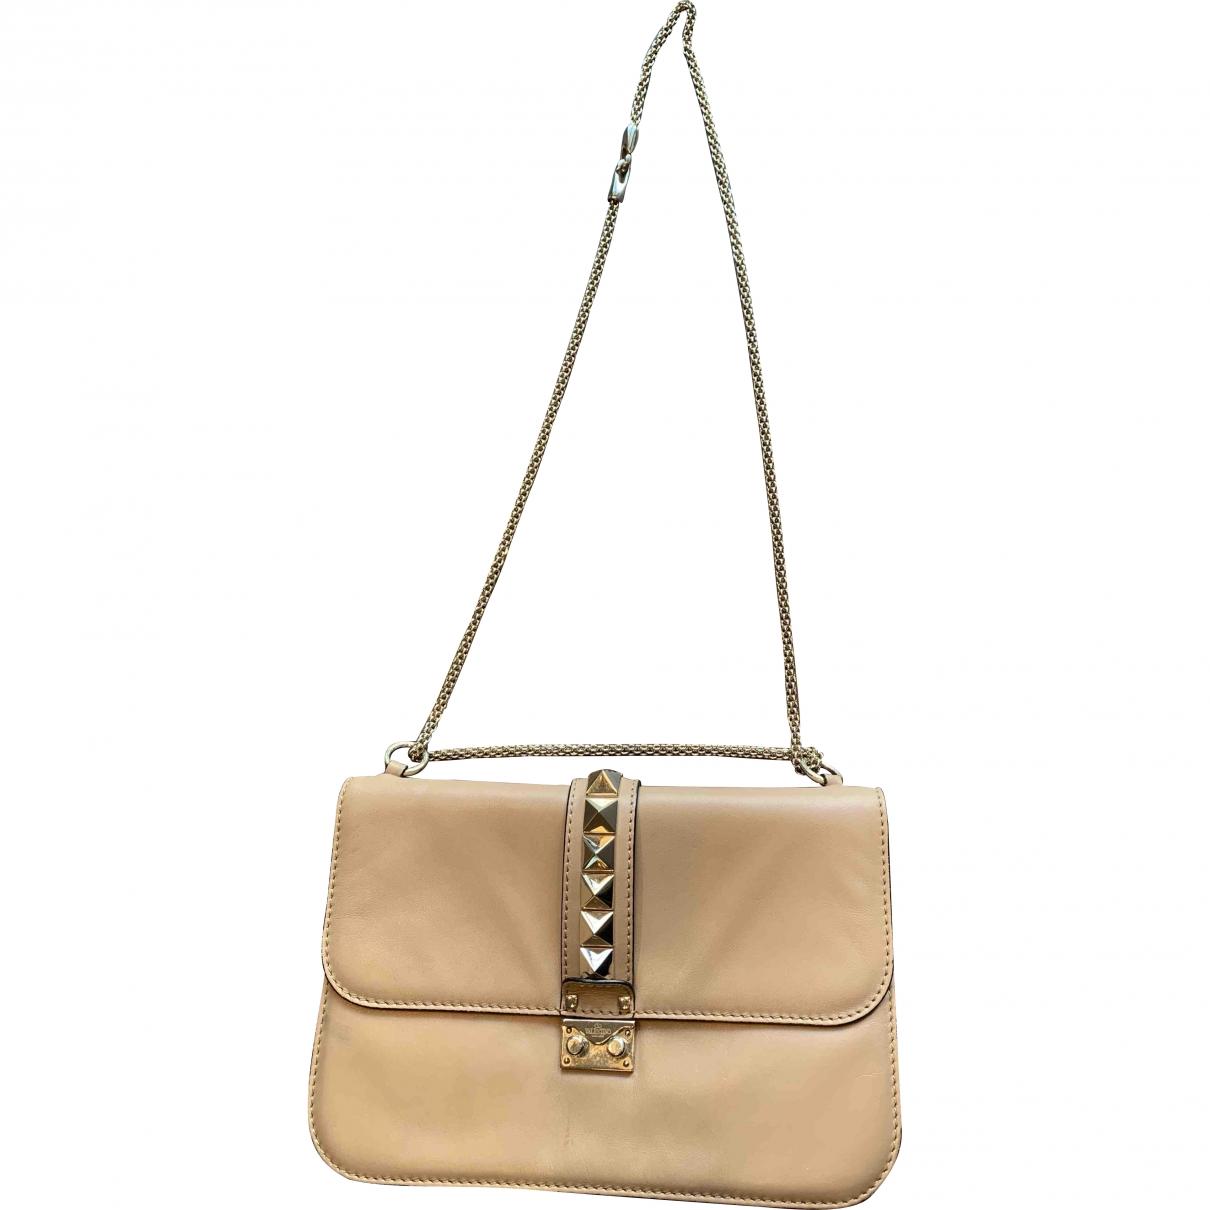 Valentino Garavani Glam Lock Beige Leather handbag for Women \N